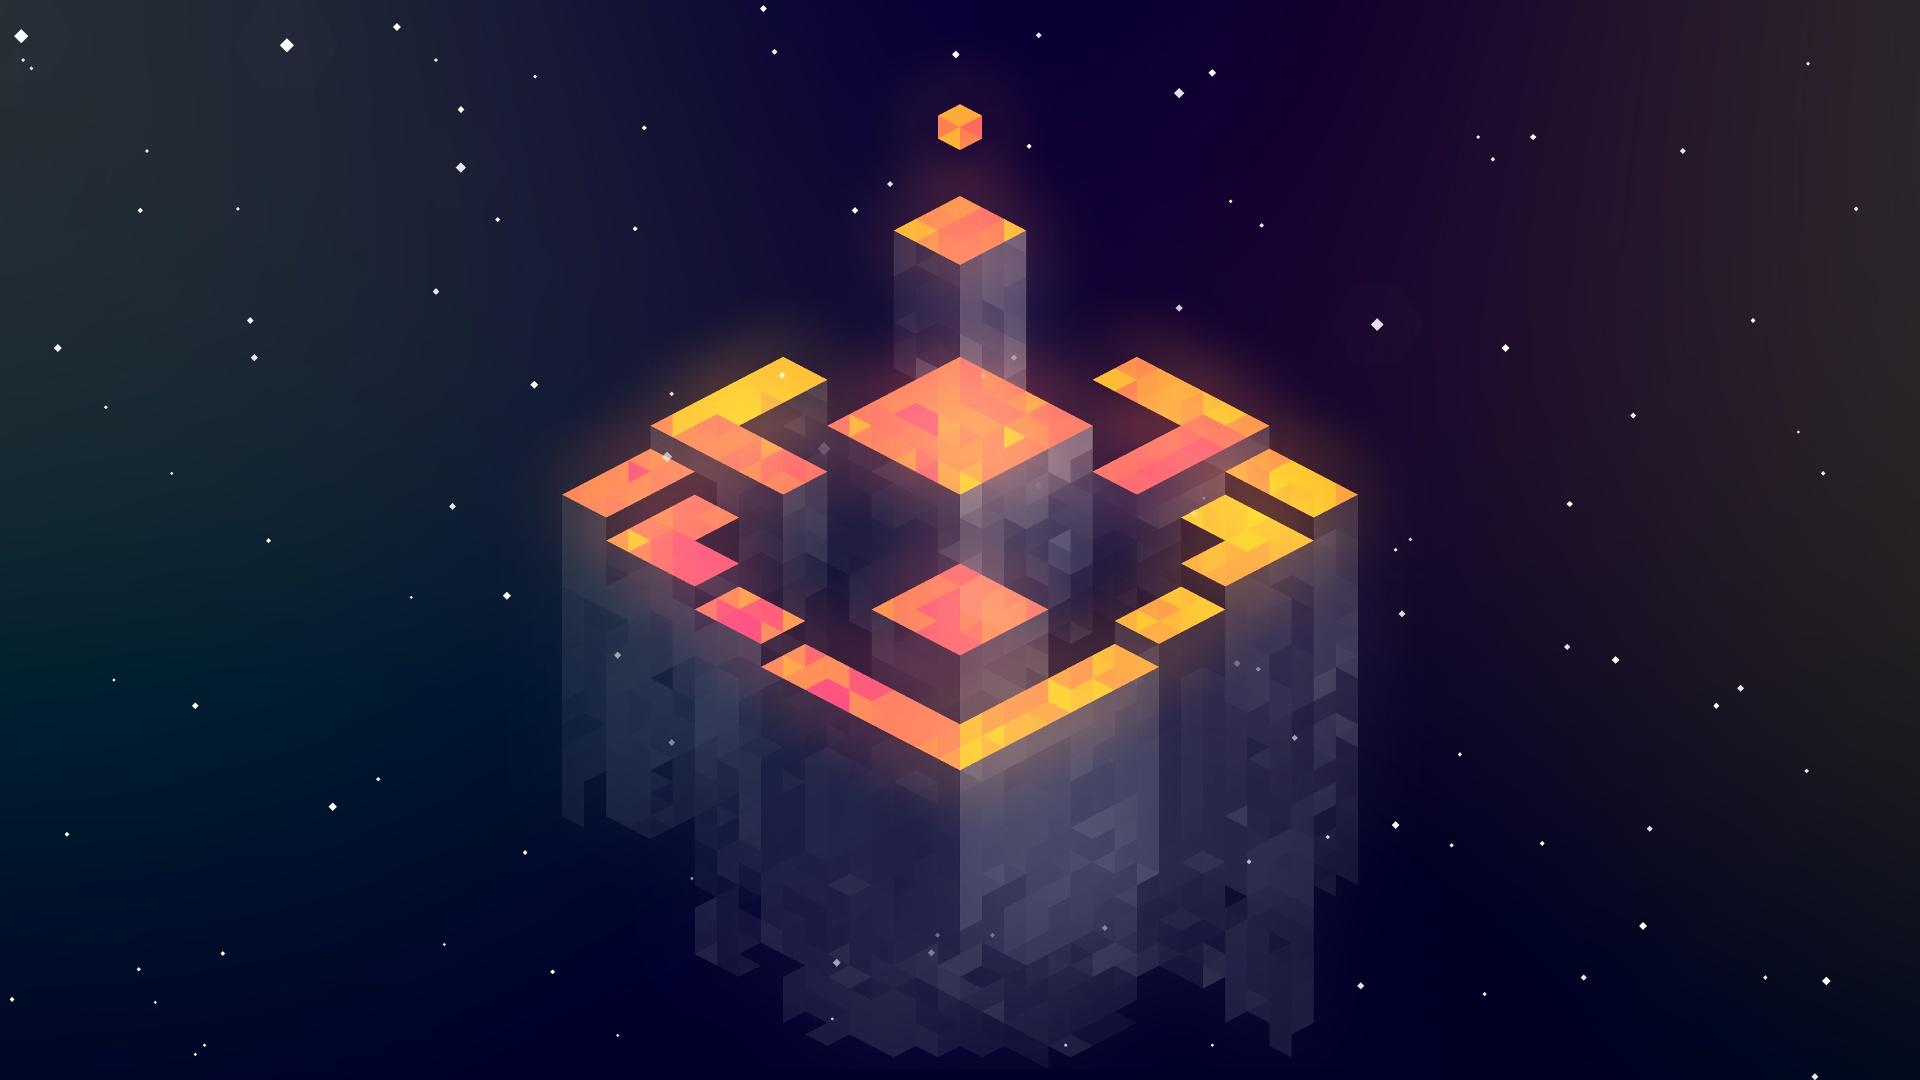 General 1920x1080 isometric minimalism Fez  abstract artwork digital art video games video game art